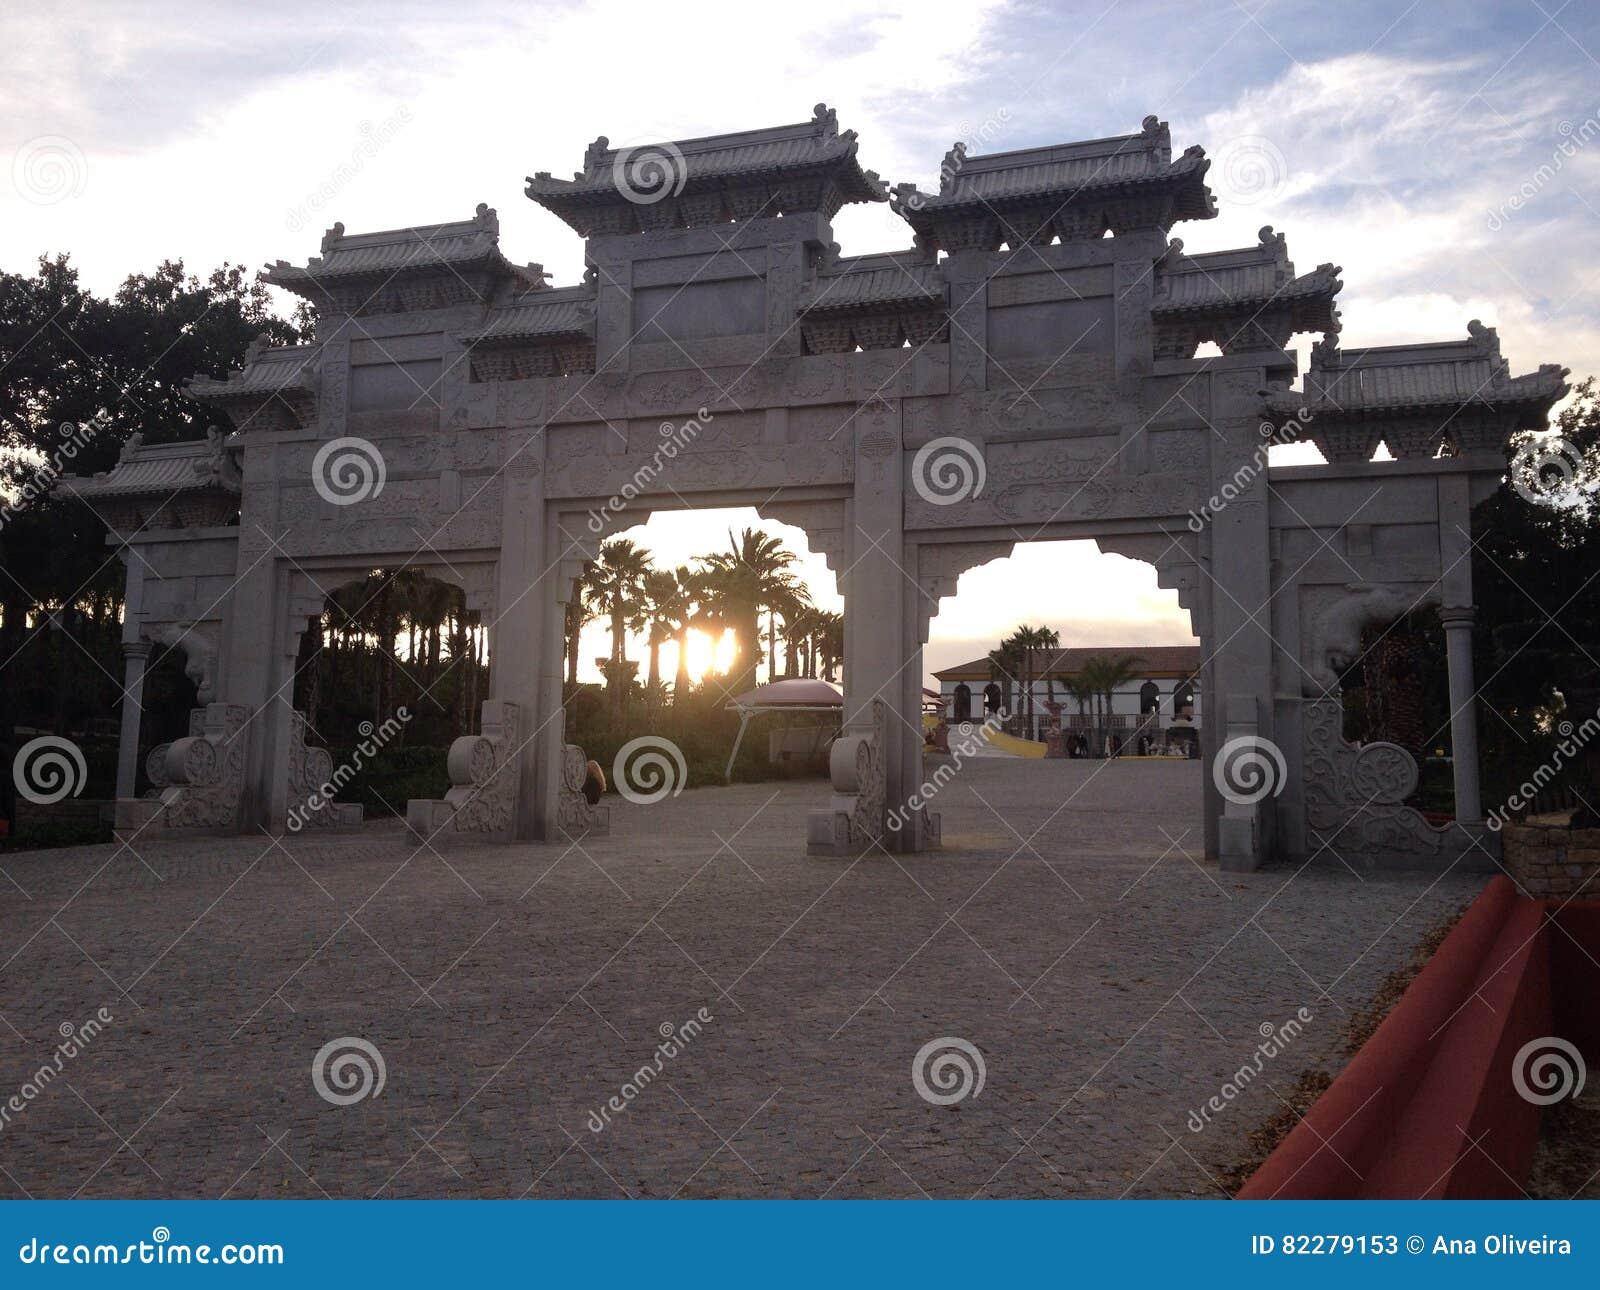 Asian doorway stock image. Image of style, japanese, doorway